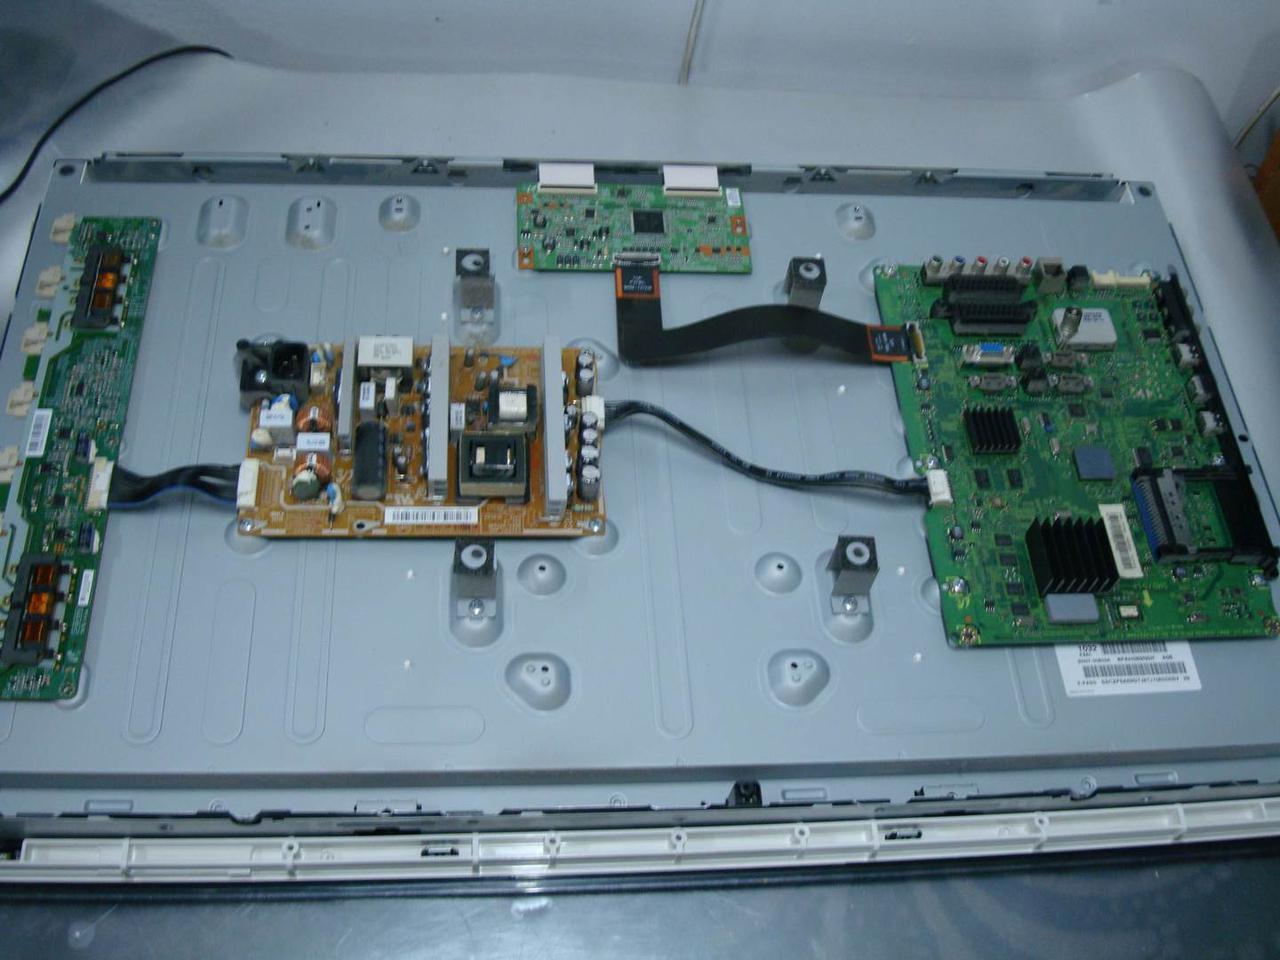 Запчасти к телевизору Samsung LE32C630K1W (BN44-00339D, S120APM4C4LV0.4, SSI320_4UH01 REV 0.3, BN96-12723A)